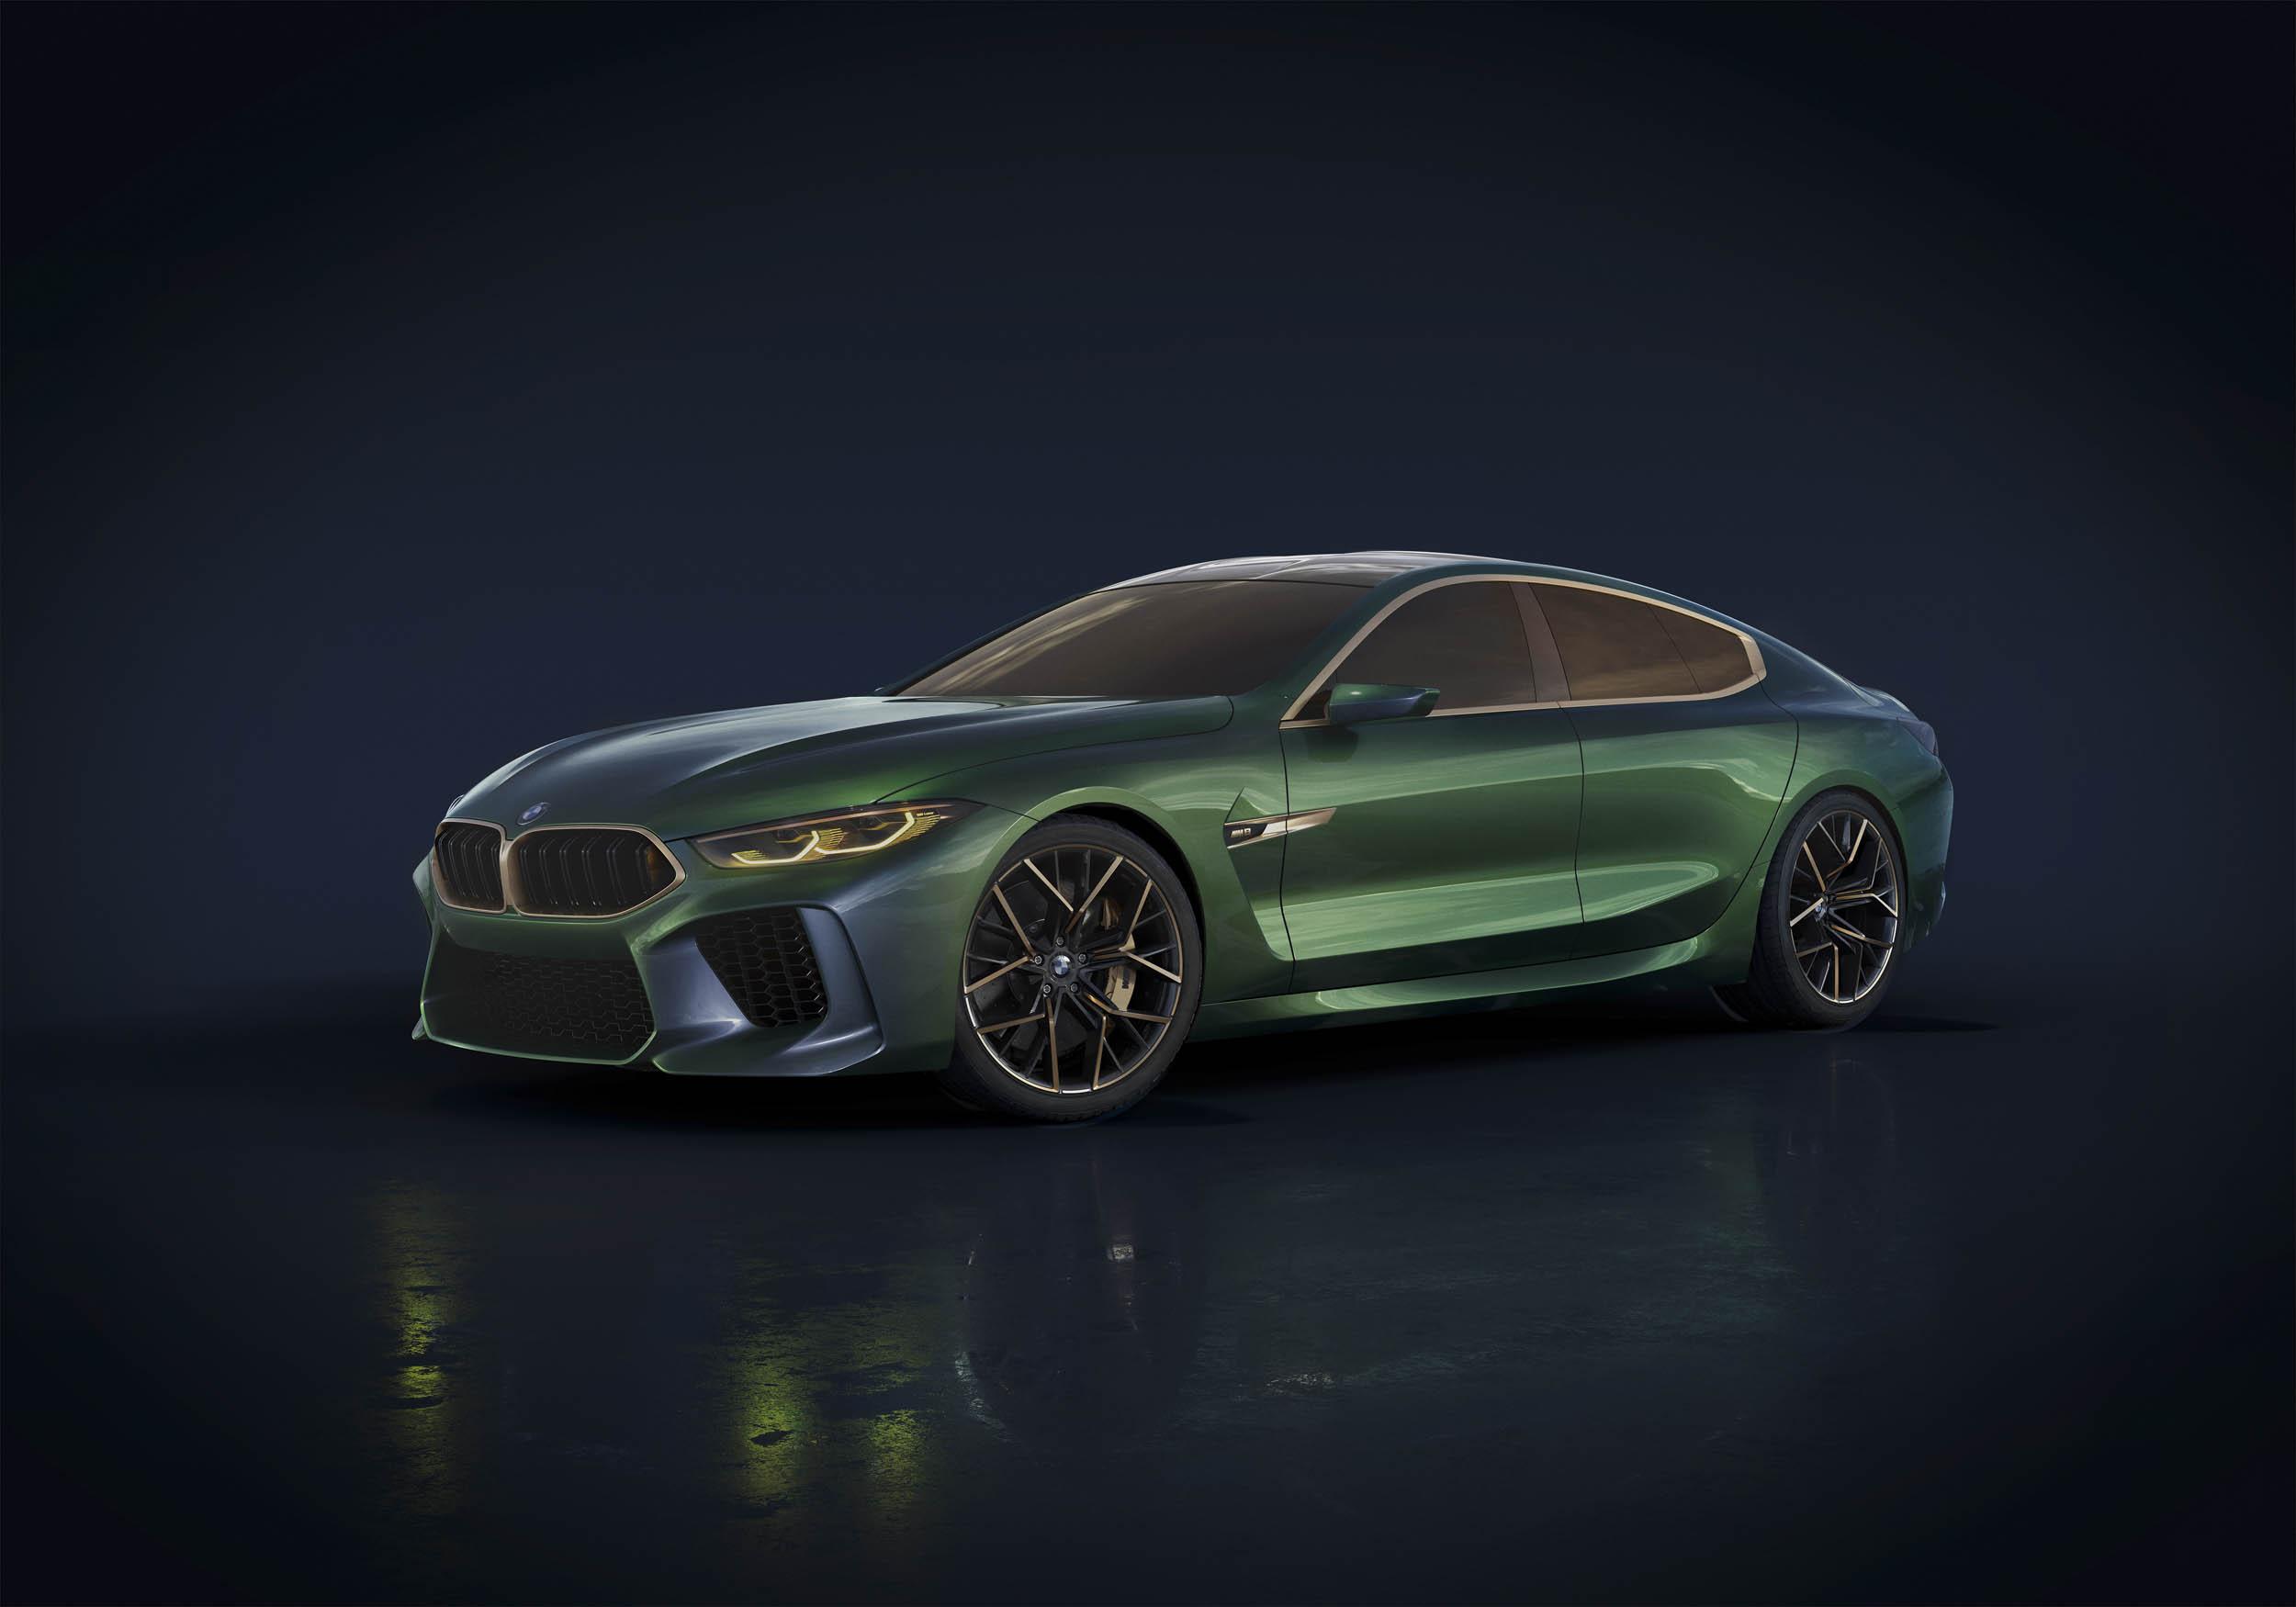 BMW M8 Gran Coupe concept front 3/4